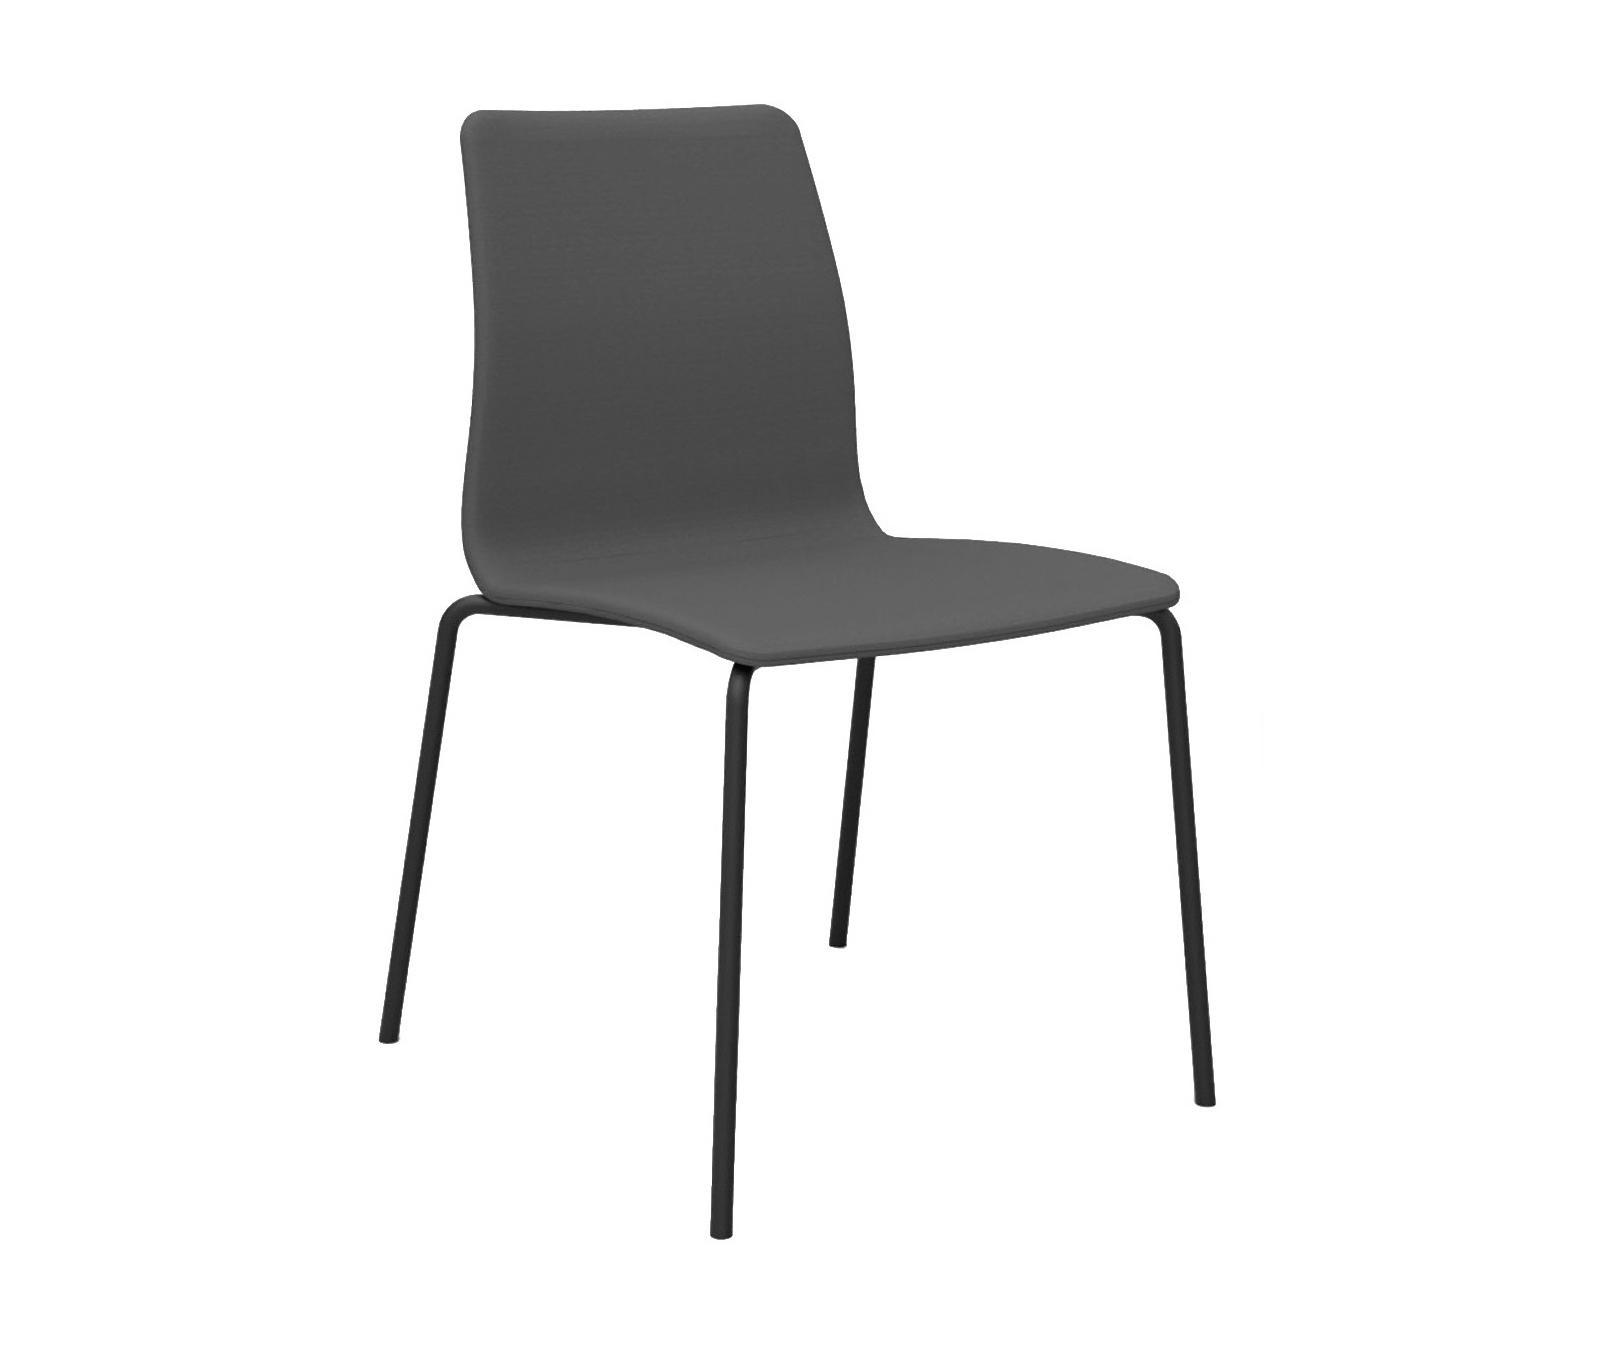 MAVERICK PLUS STAPELBARER OBJEKTSTUHL - Stühle von KFF | Architonic